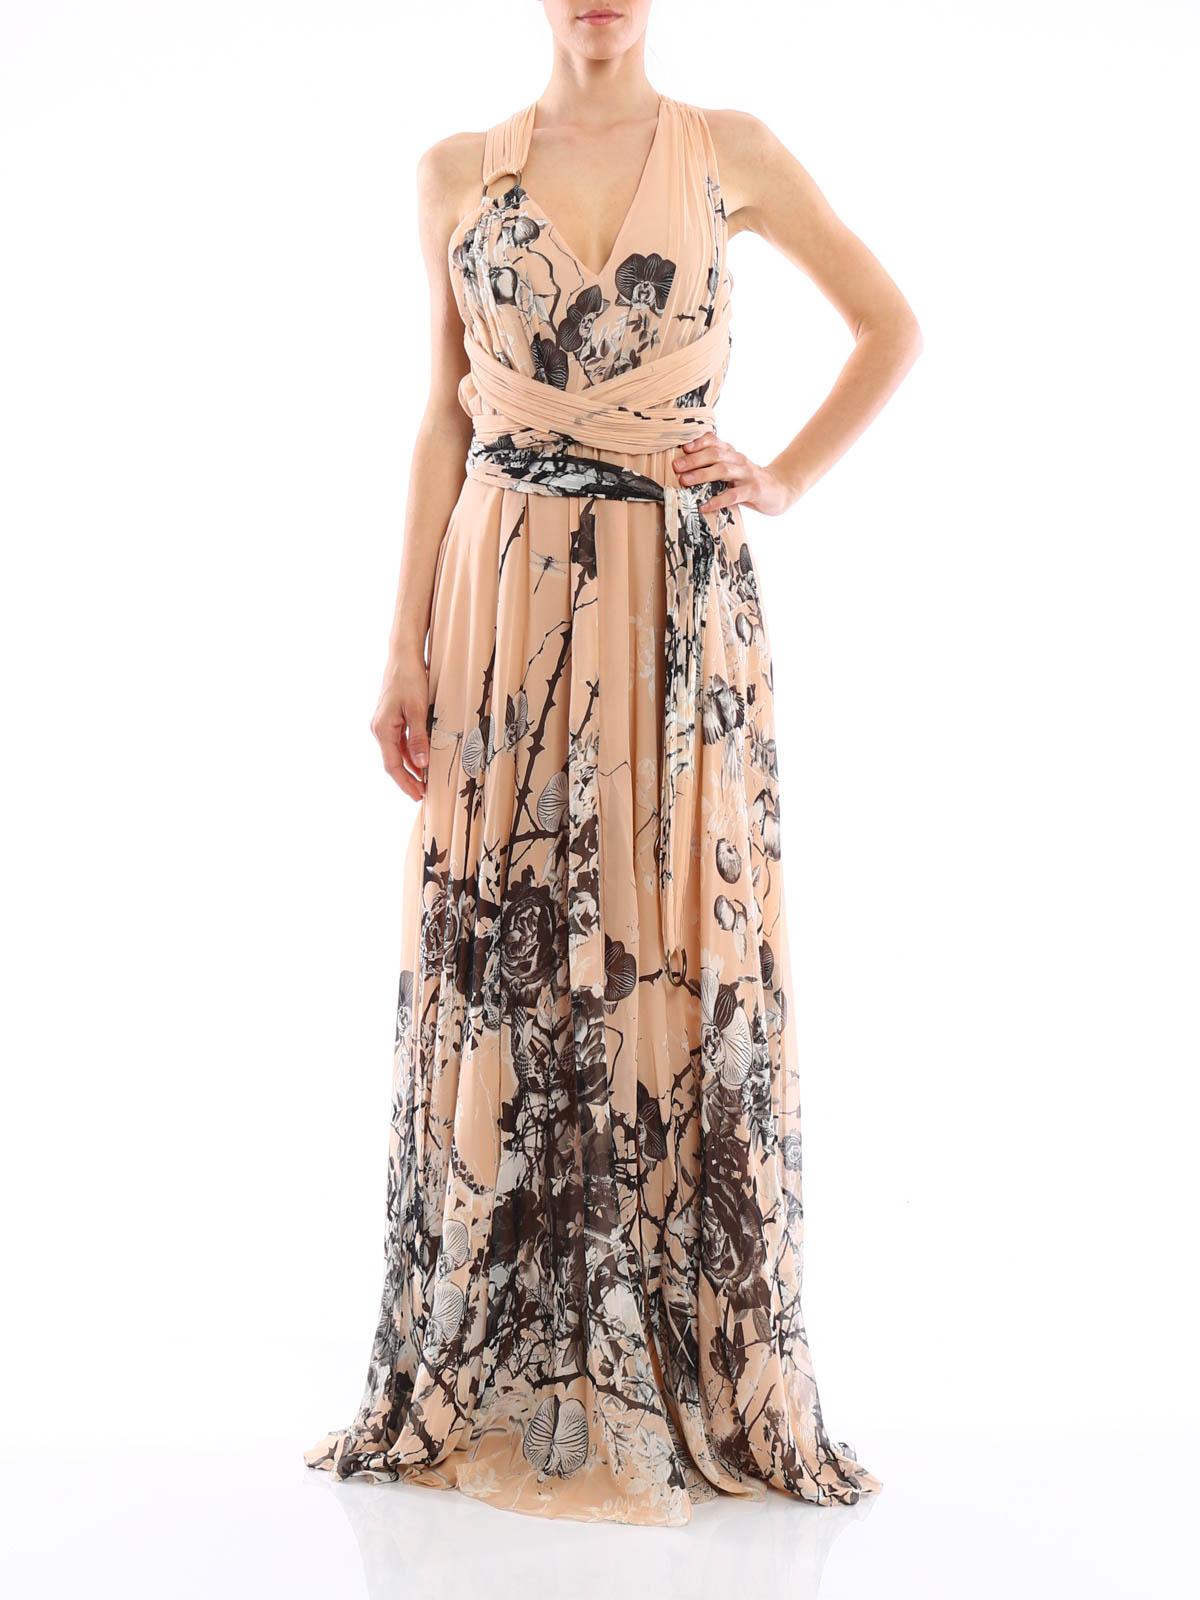 Abiti Cerimonia Just Cavalli.Roberto Cavalli Floral Print Long Silk Dress Evening Dresses